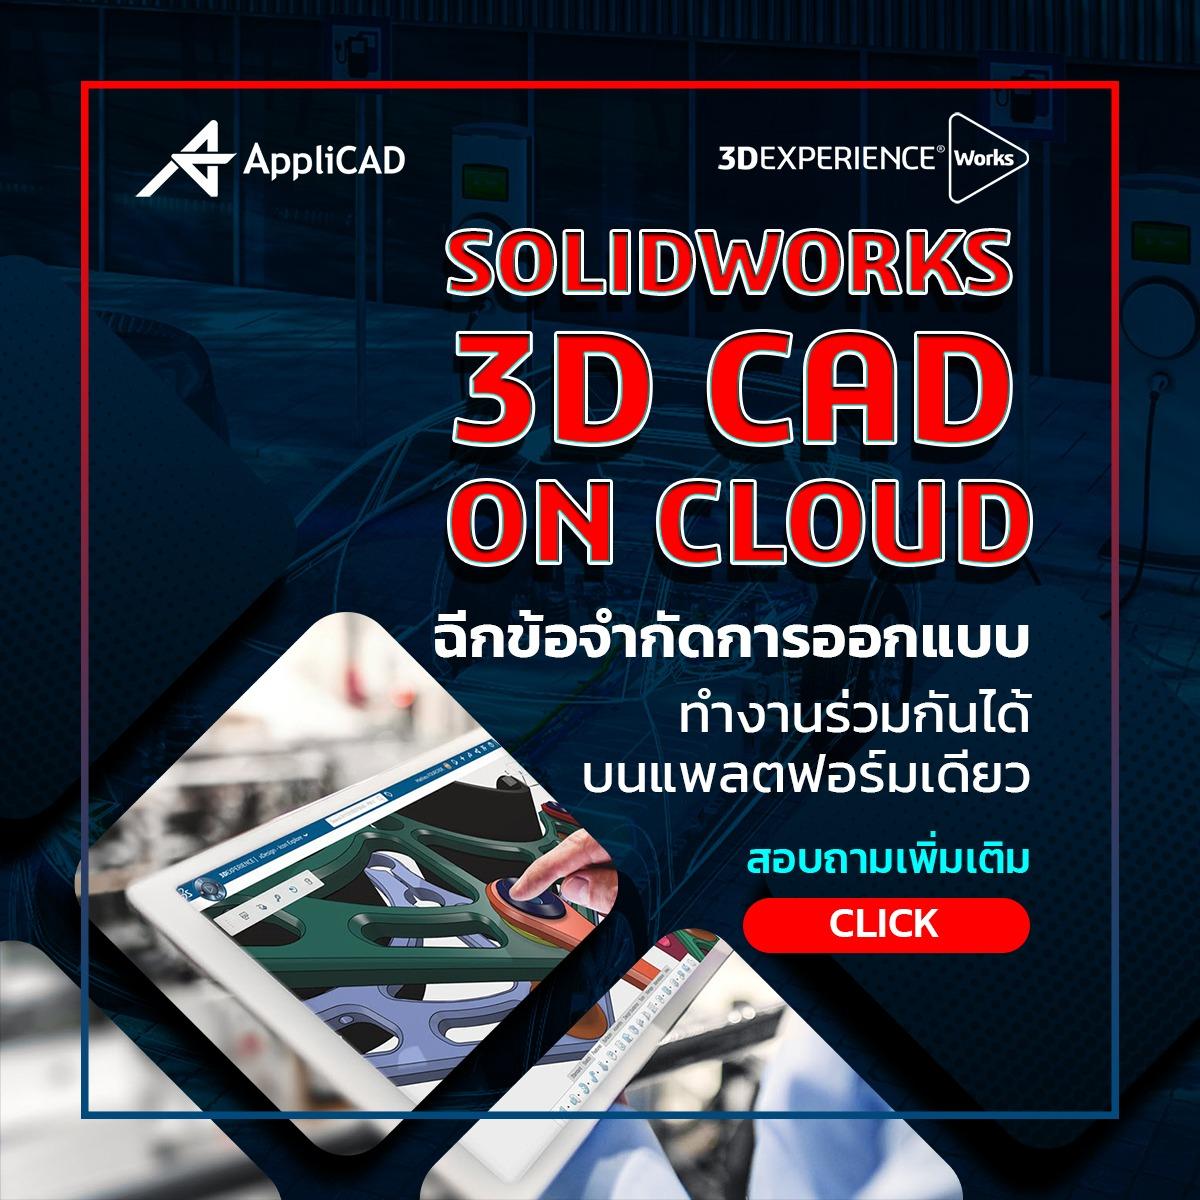 SOLIDWORKS on Cloud - ใช้ SOLIDWORKS Online ได้จากทุกที่ทุกเวลา รองรับทุกอุปกรณ์ พร้อมทำงานร่วมกันบนระบบ Cloud Platform